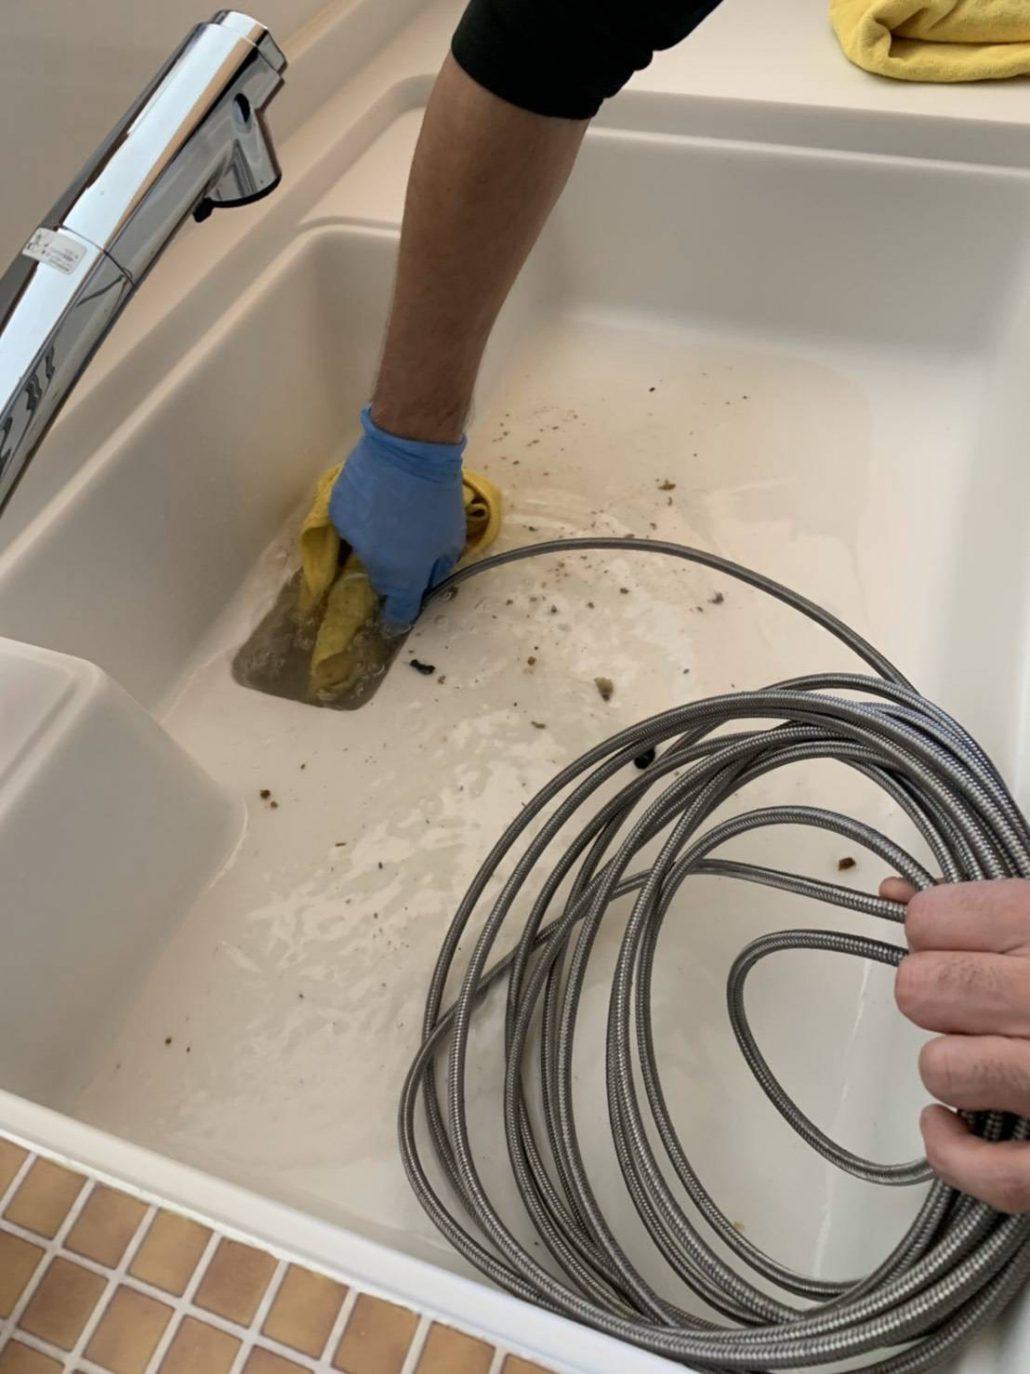 排水管洗浄(キッチン、浴室、洗面所、洗濯機の配管、排水マスの高圧洗浄)